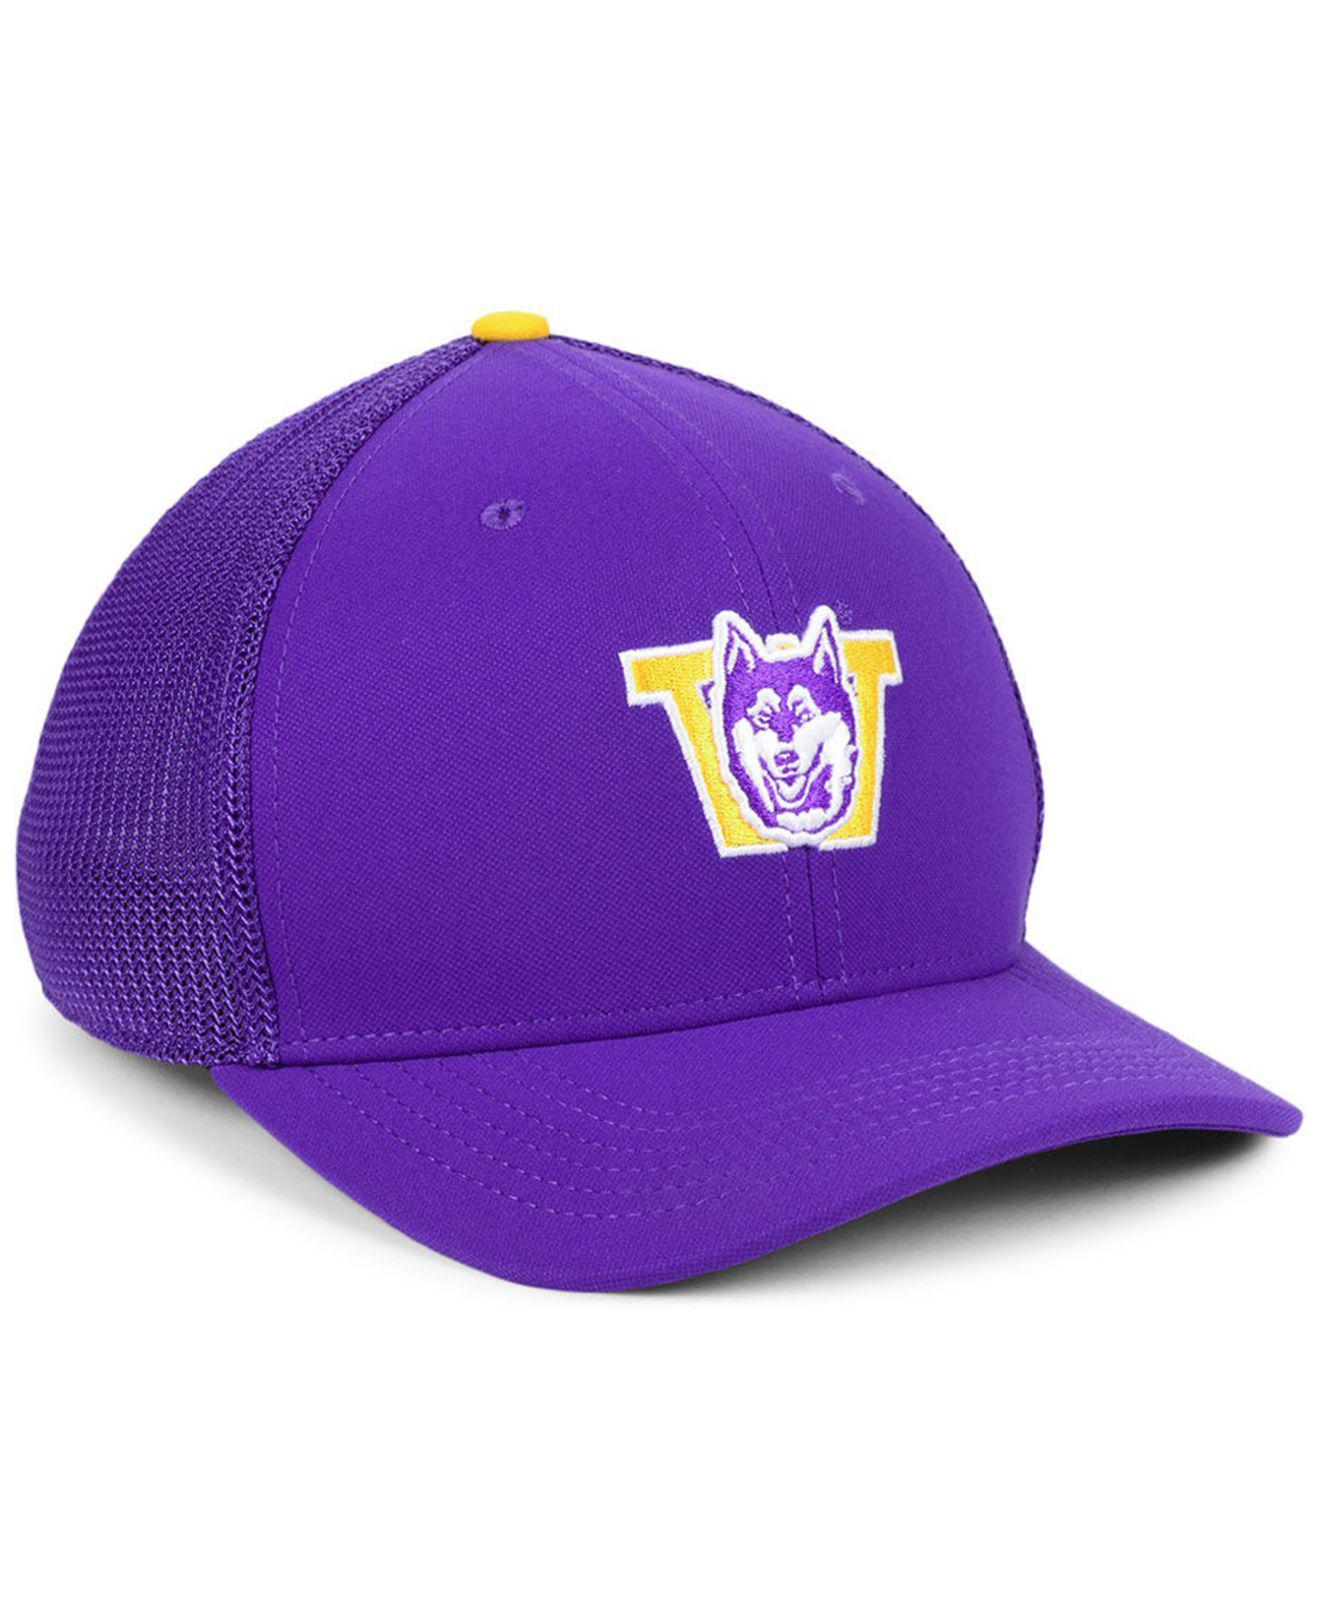 detailed look 1ab89 6dee1 ... cheap nike purple washington huskies col aro swooshflex cap for men  lyst. view fullscreen f9924